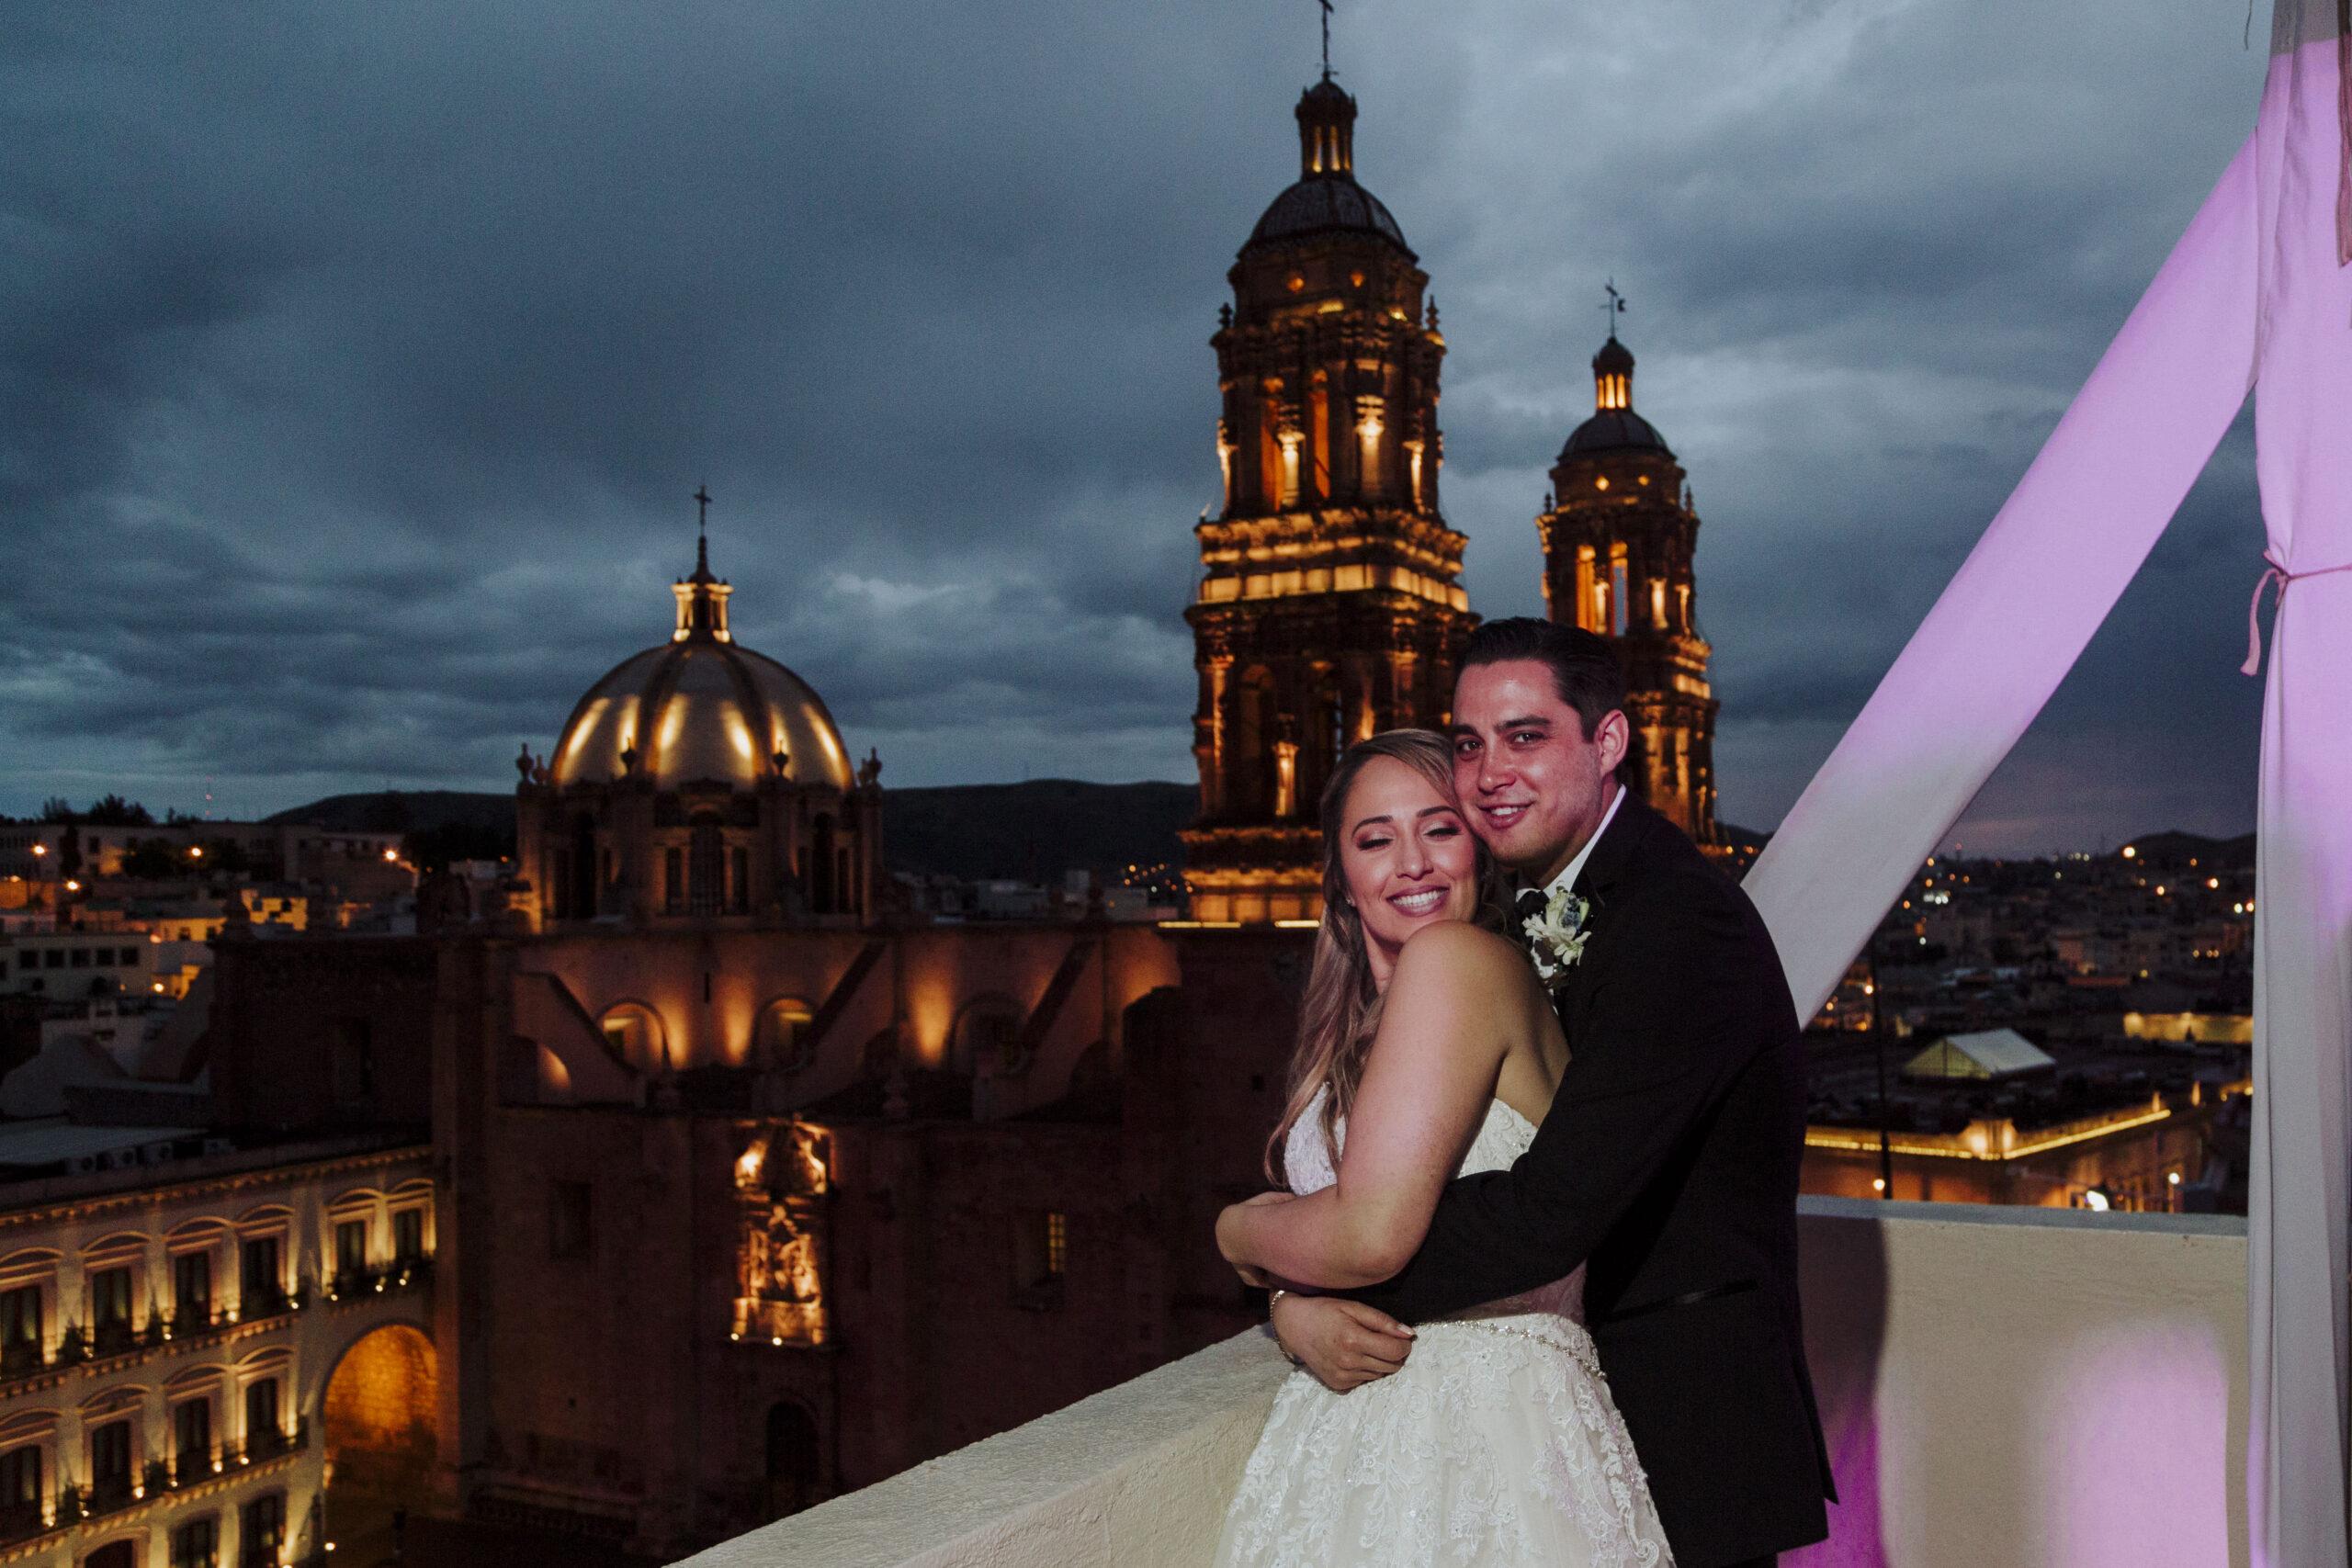 javier_noriega_fotografo_profesional_bodas_zacatecas_mexico_chihuahua_photographer74